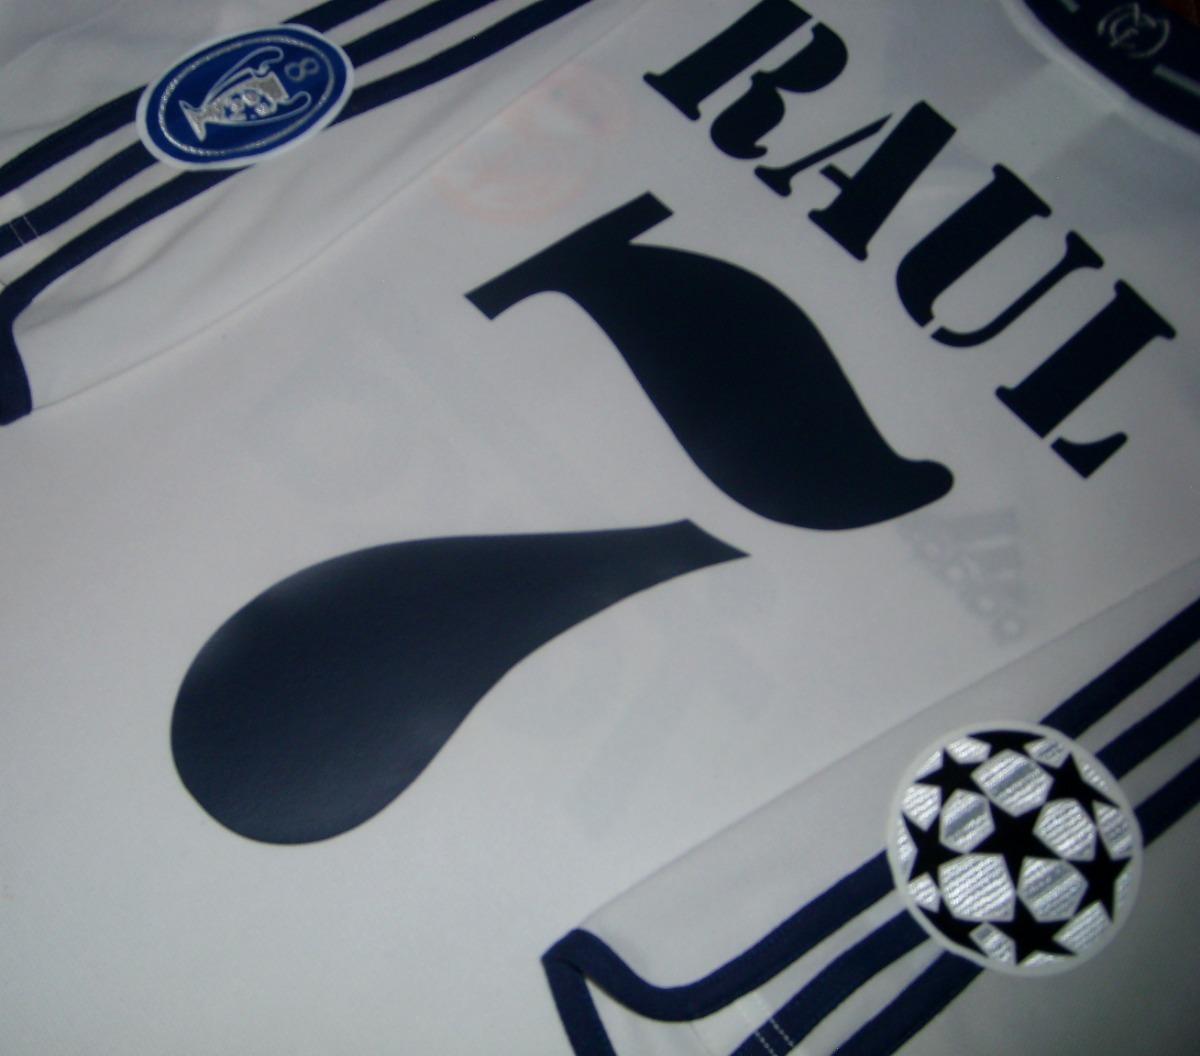 b65ed090201 real madrid adidas champions league 2001 raul gonzalez unica. Cargando zoom.